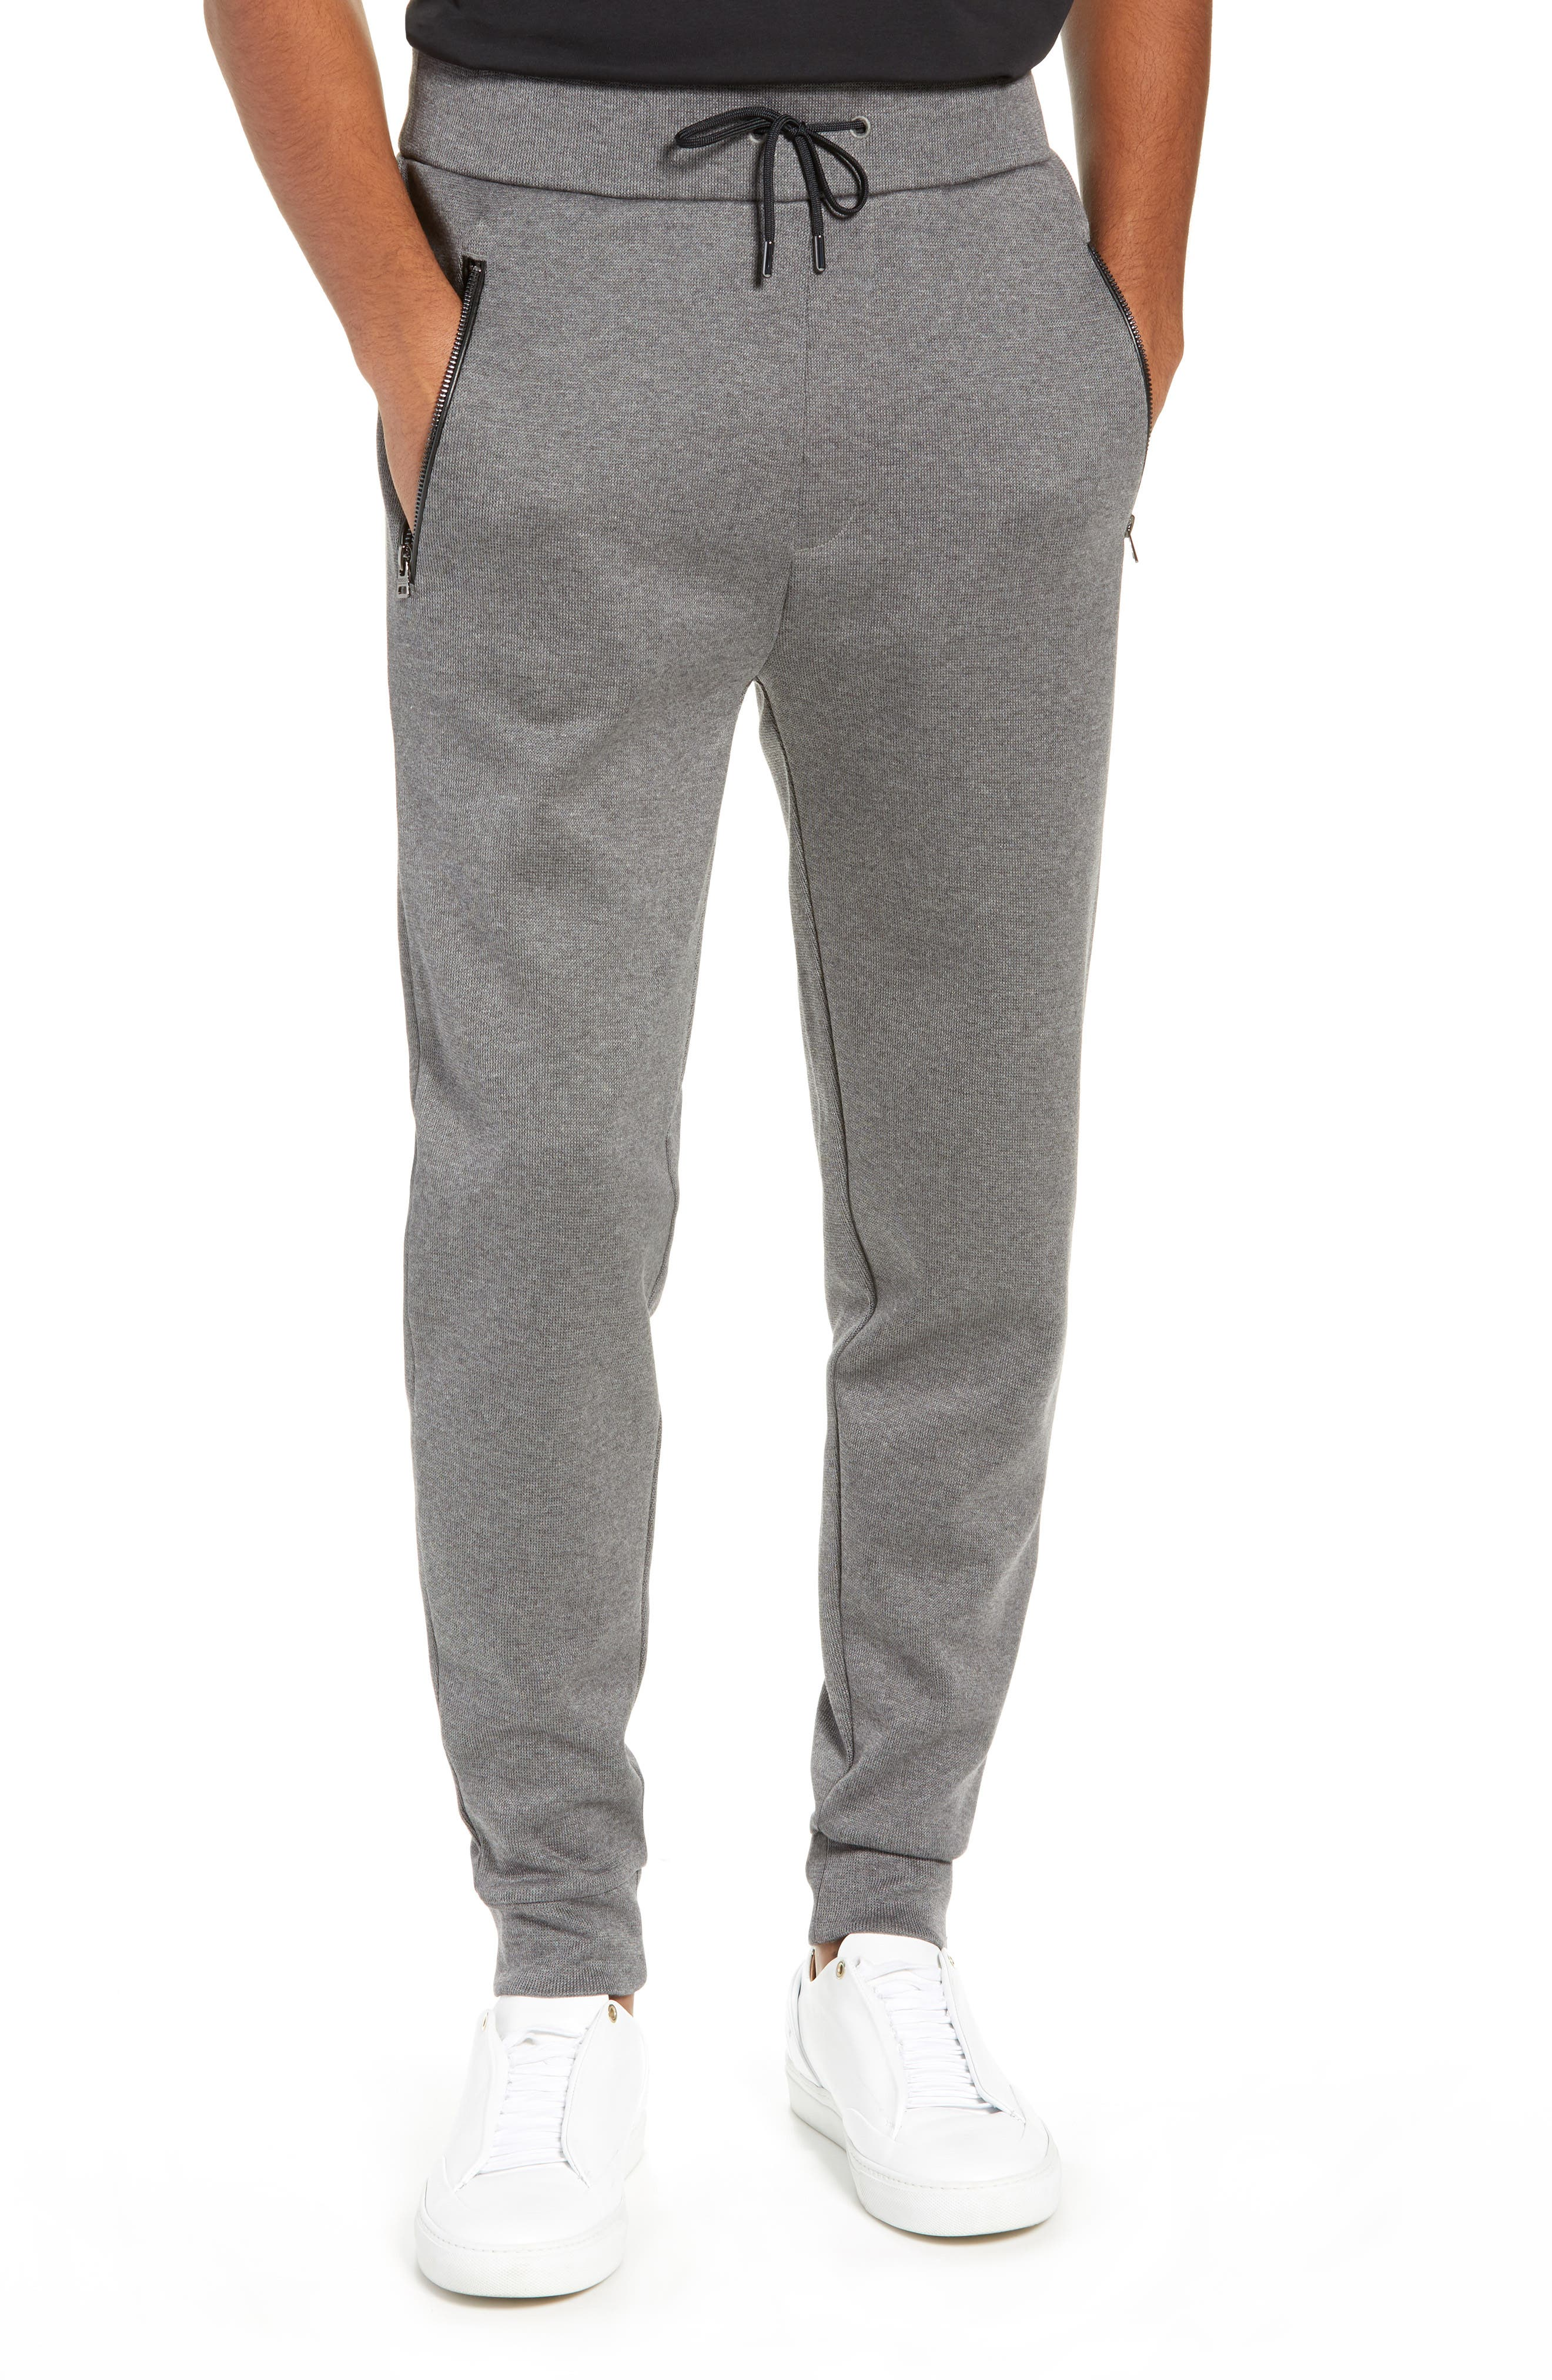 Derg Cotton Sweatpants,                         Main,                         color, GREY